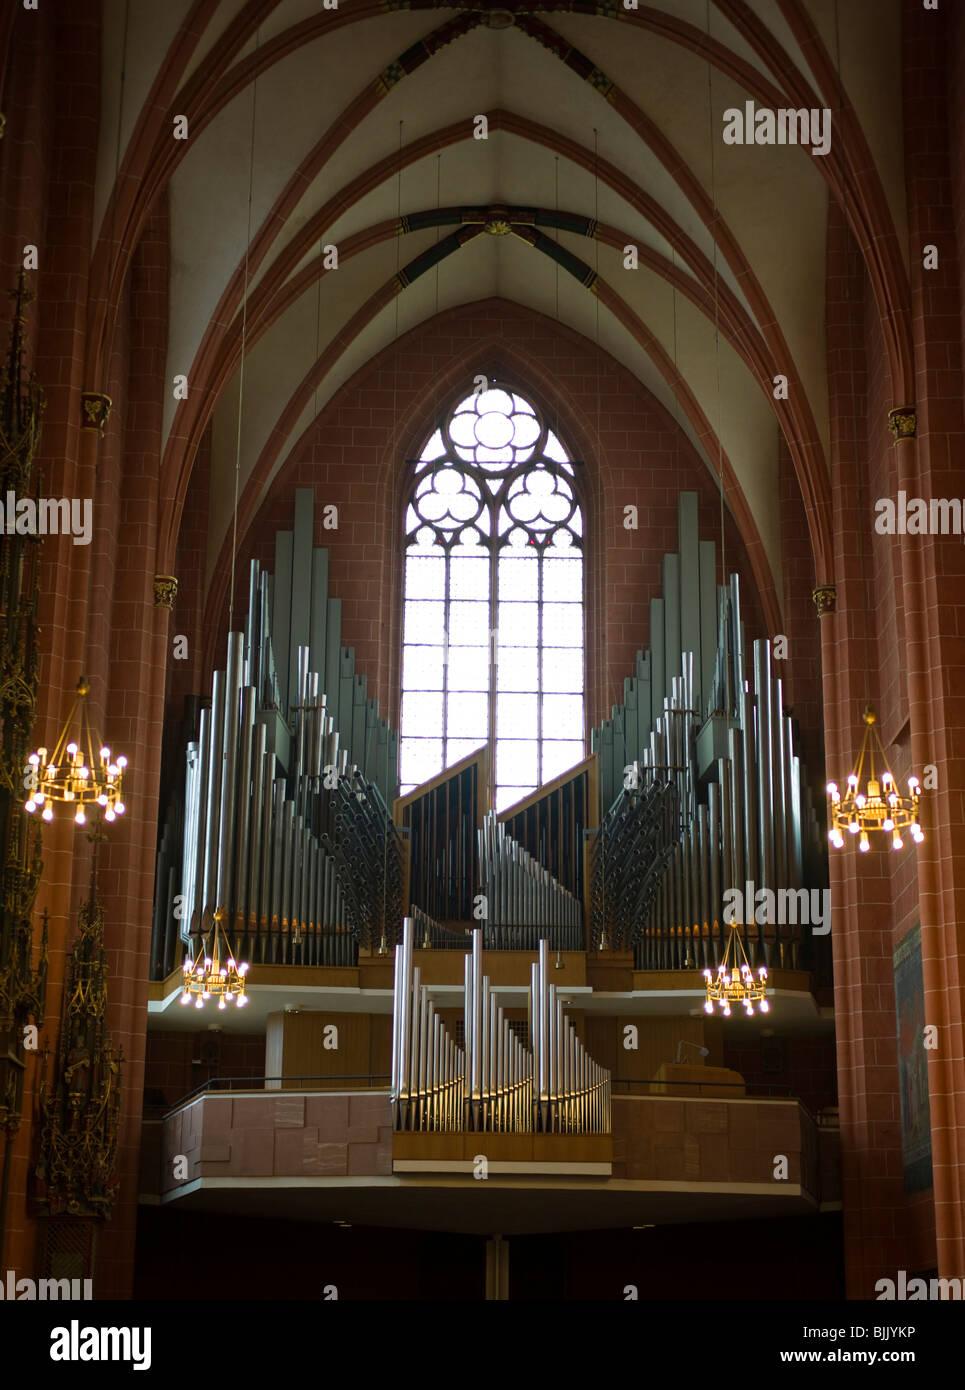 Imperial Cathedral of Saint Bartholomew, Frankfurt cathedral organ, Frankfurt, Hesse, Germany, Europe - Stock Image